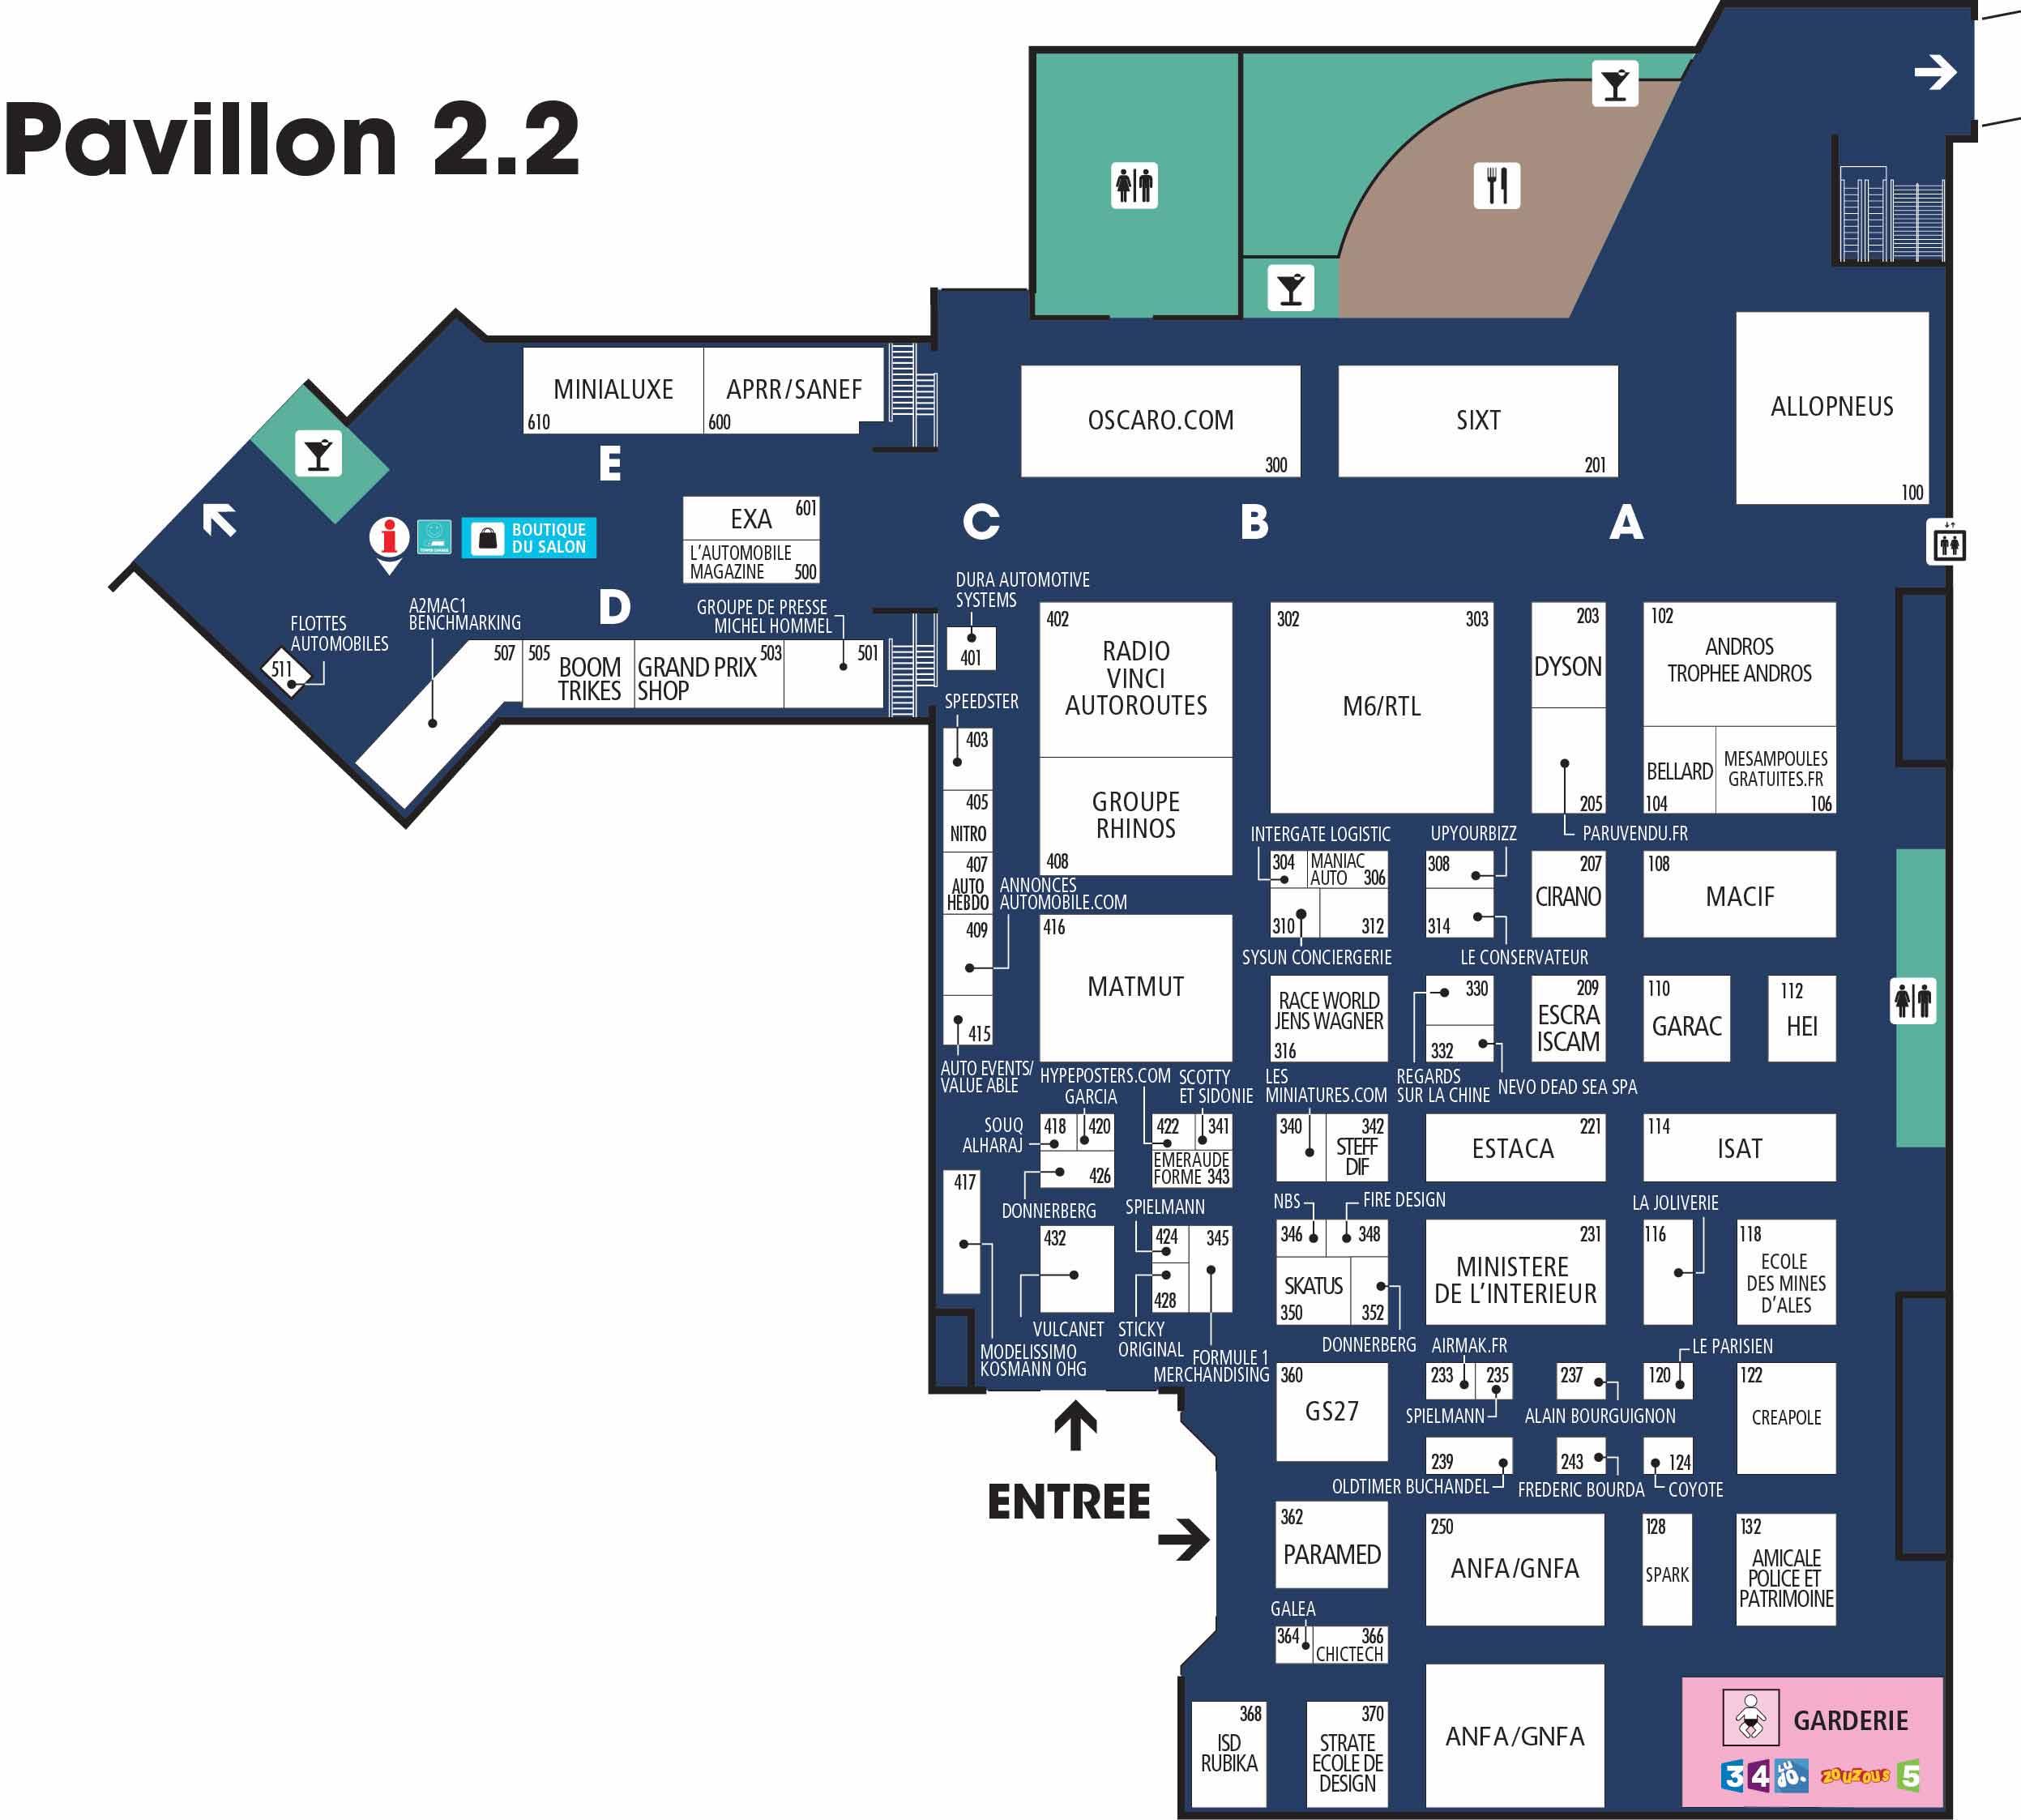 mondial-2016-pavillon-2_2.jpg